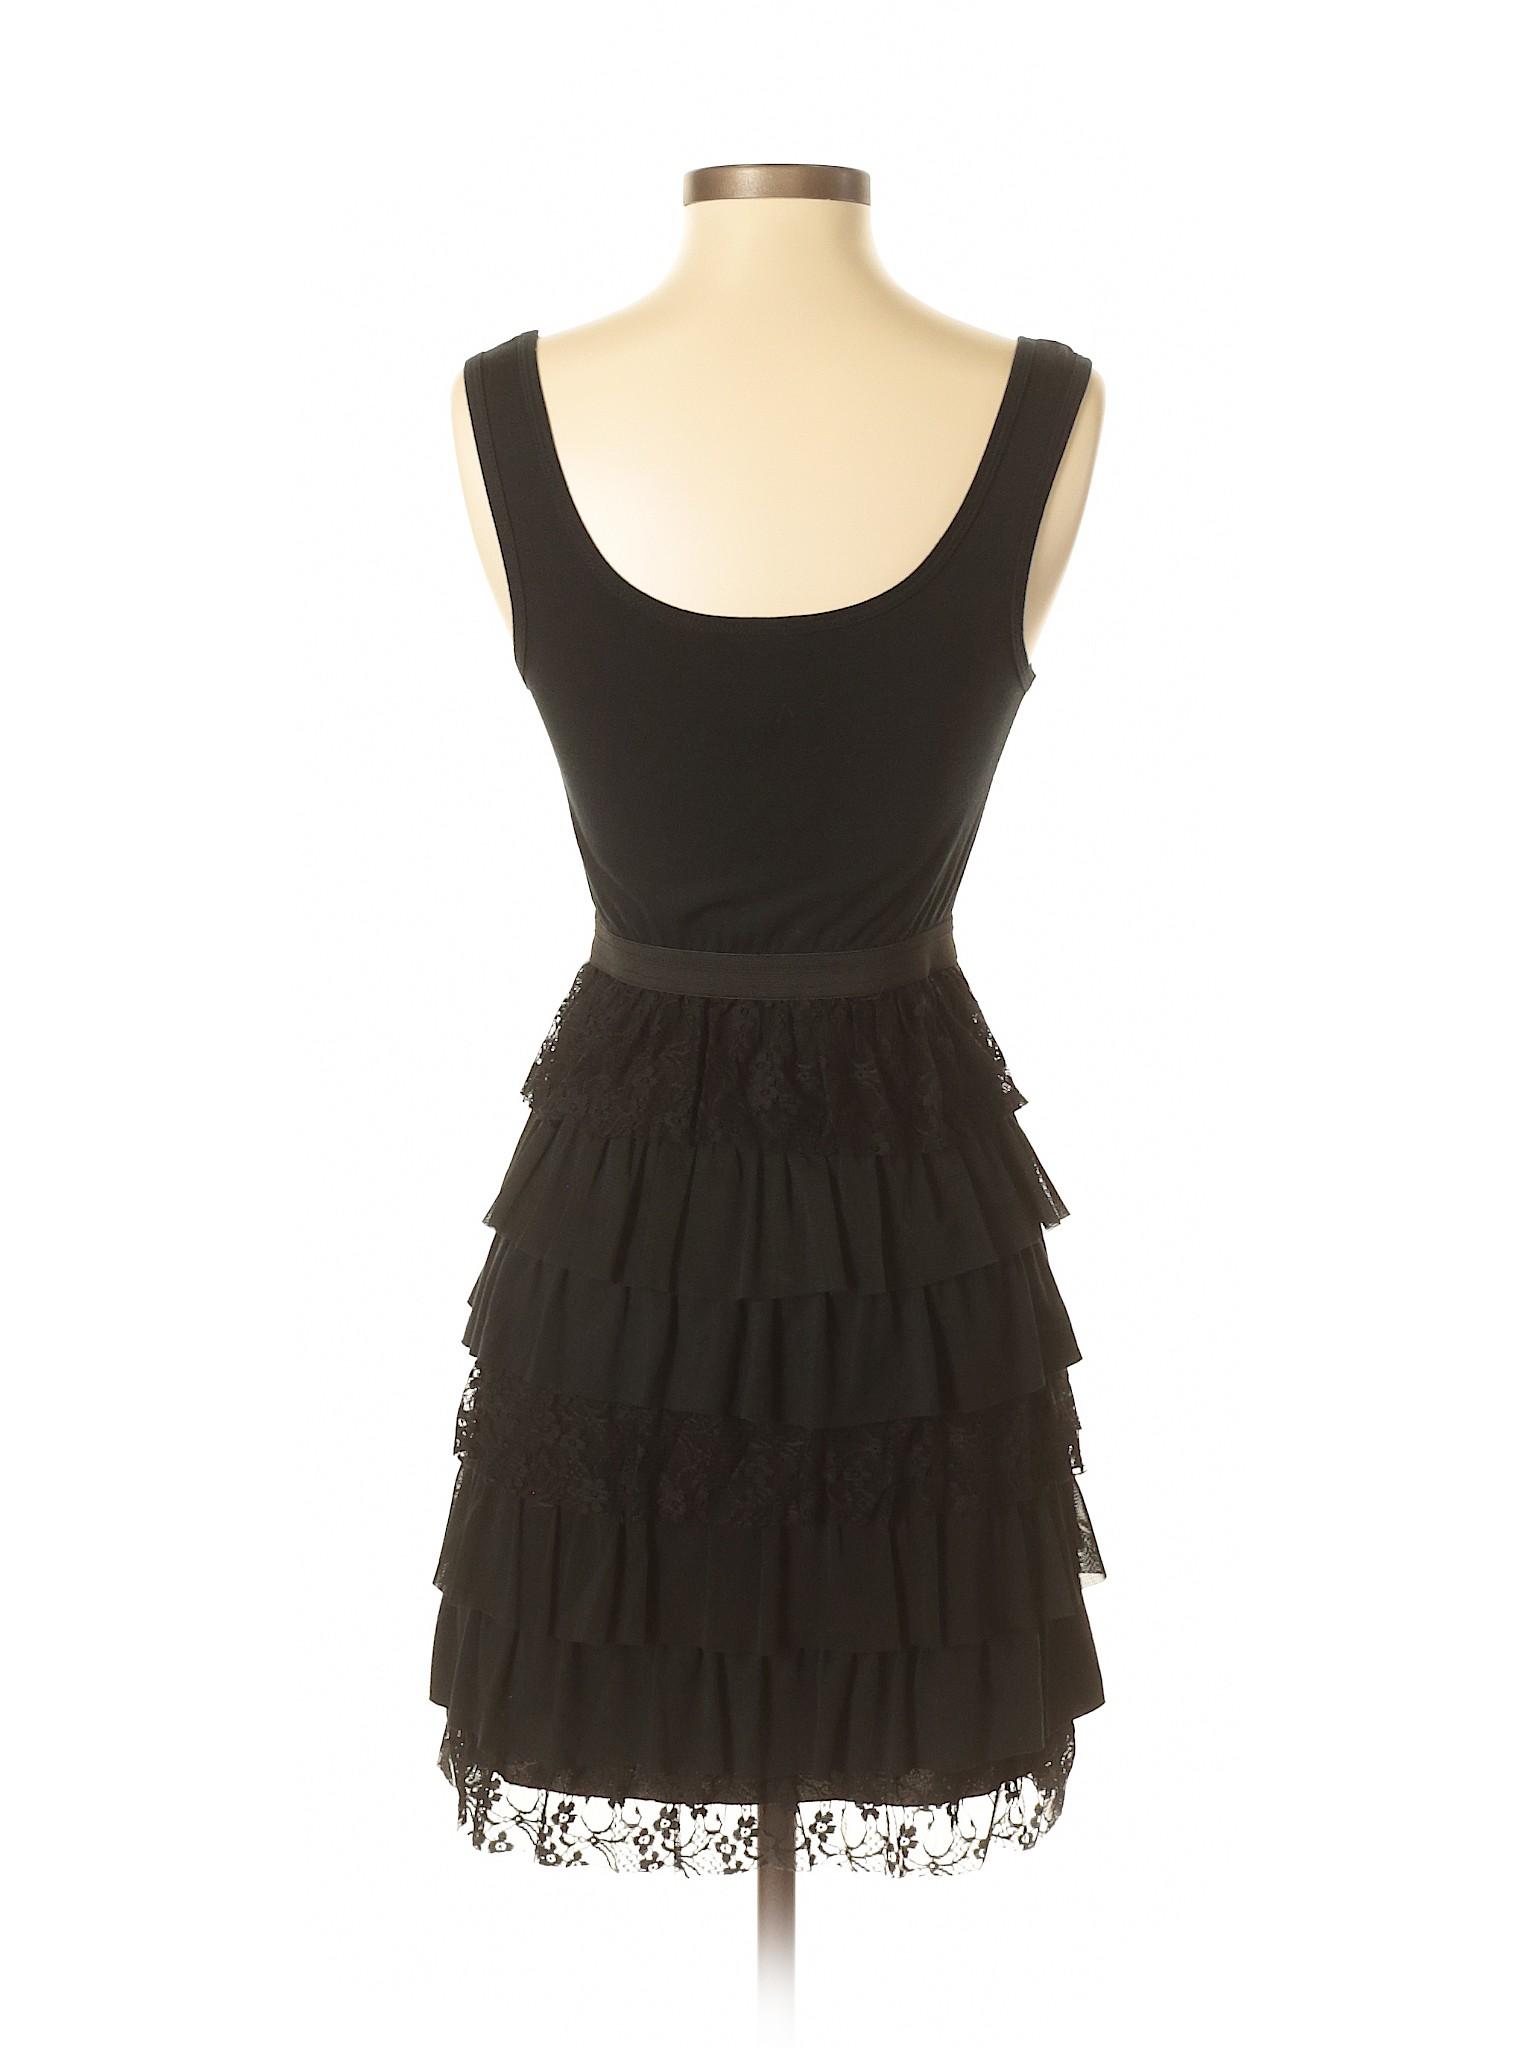 Selling Dress Dress Casual Dress Xhilaration Xhilaration Casual Xhilaration Selling Casual Selling Selling Xhilaration Casual 00Og8